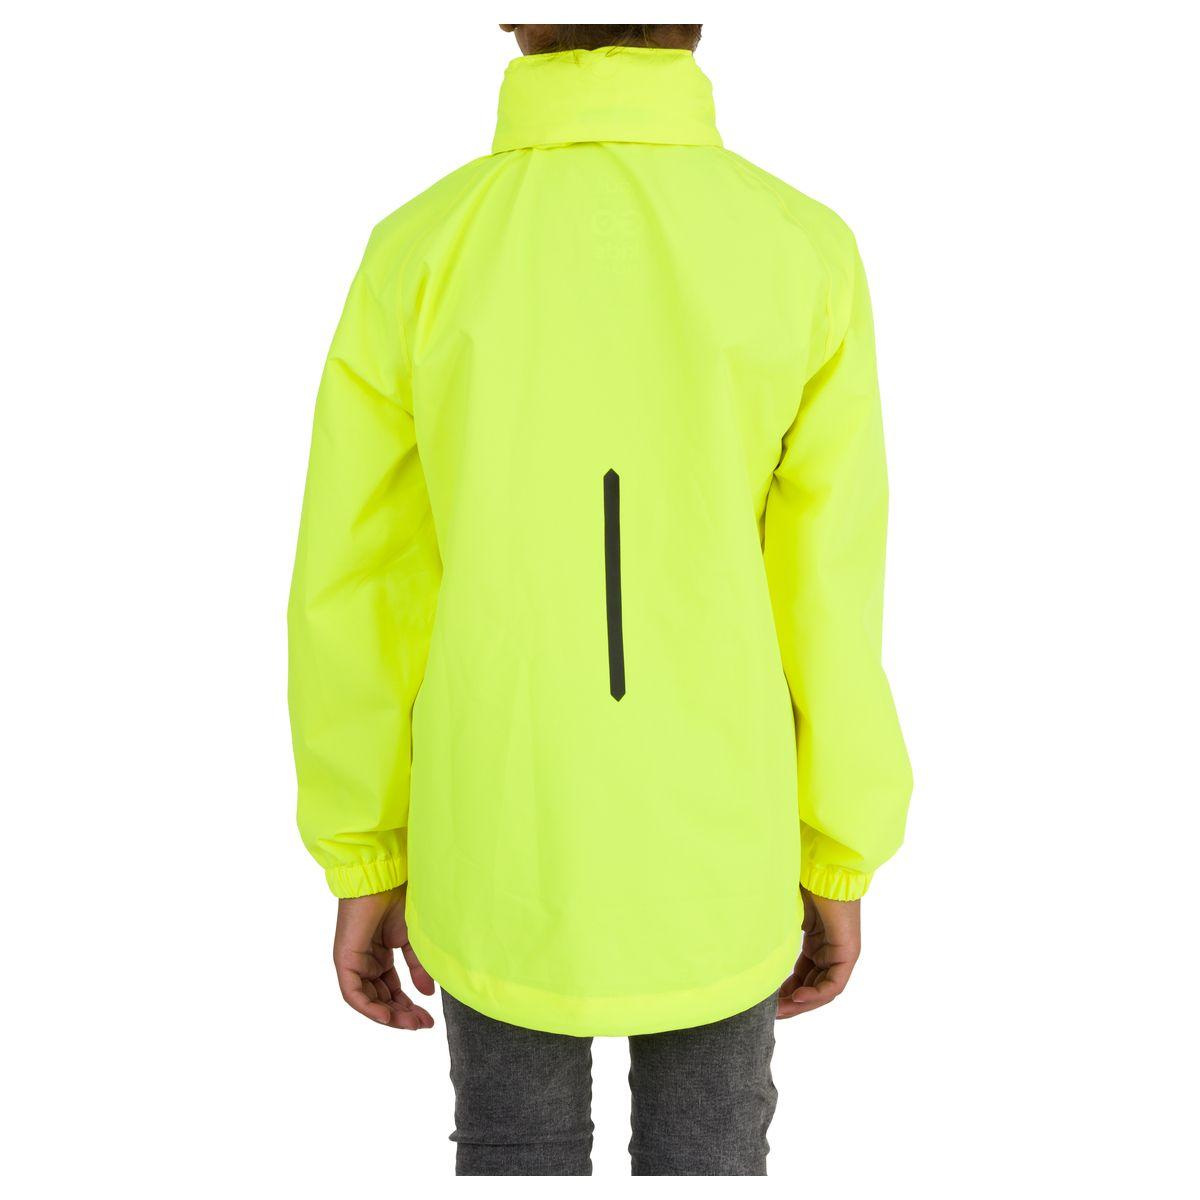 GO Kids Rain Jacket Essential fit example